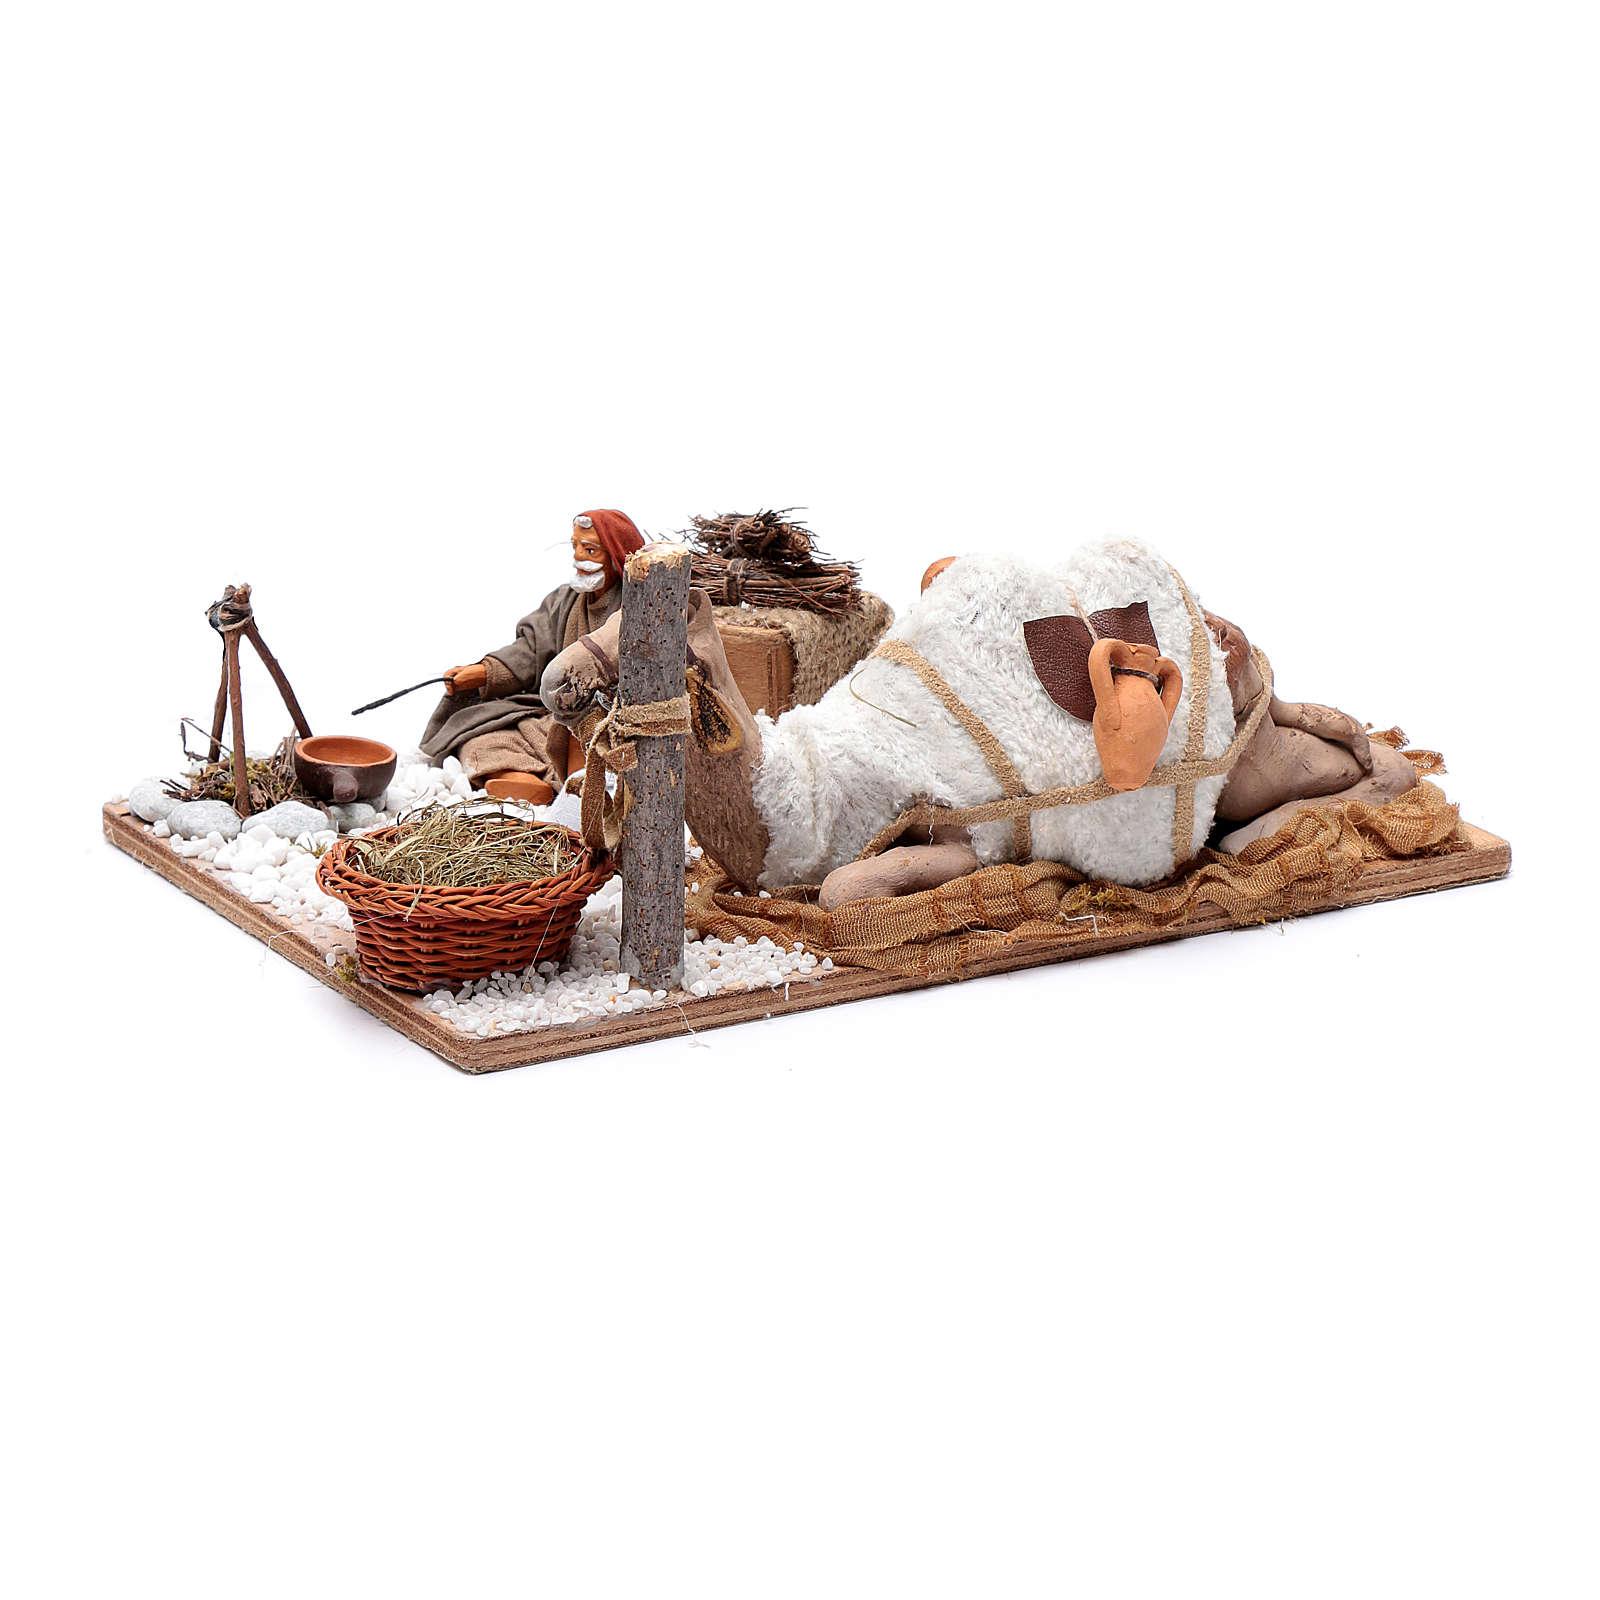 Man with camel, animated Neapolitan Nativity figurine 12cm 4